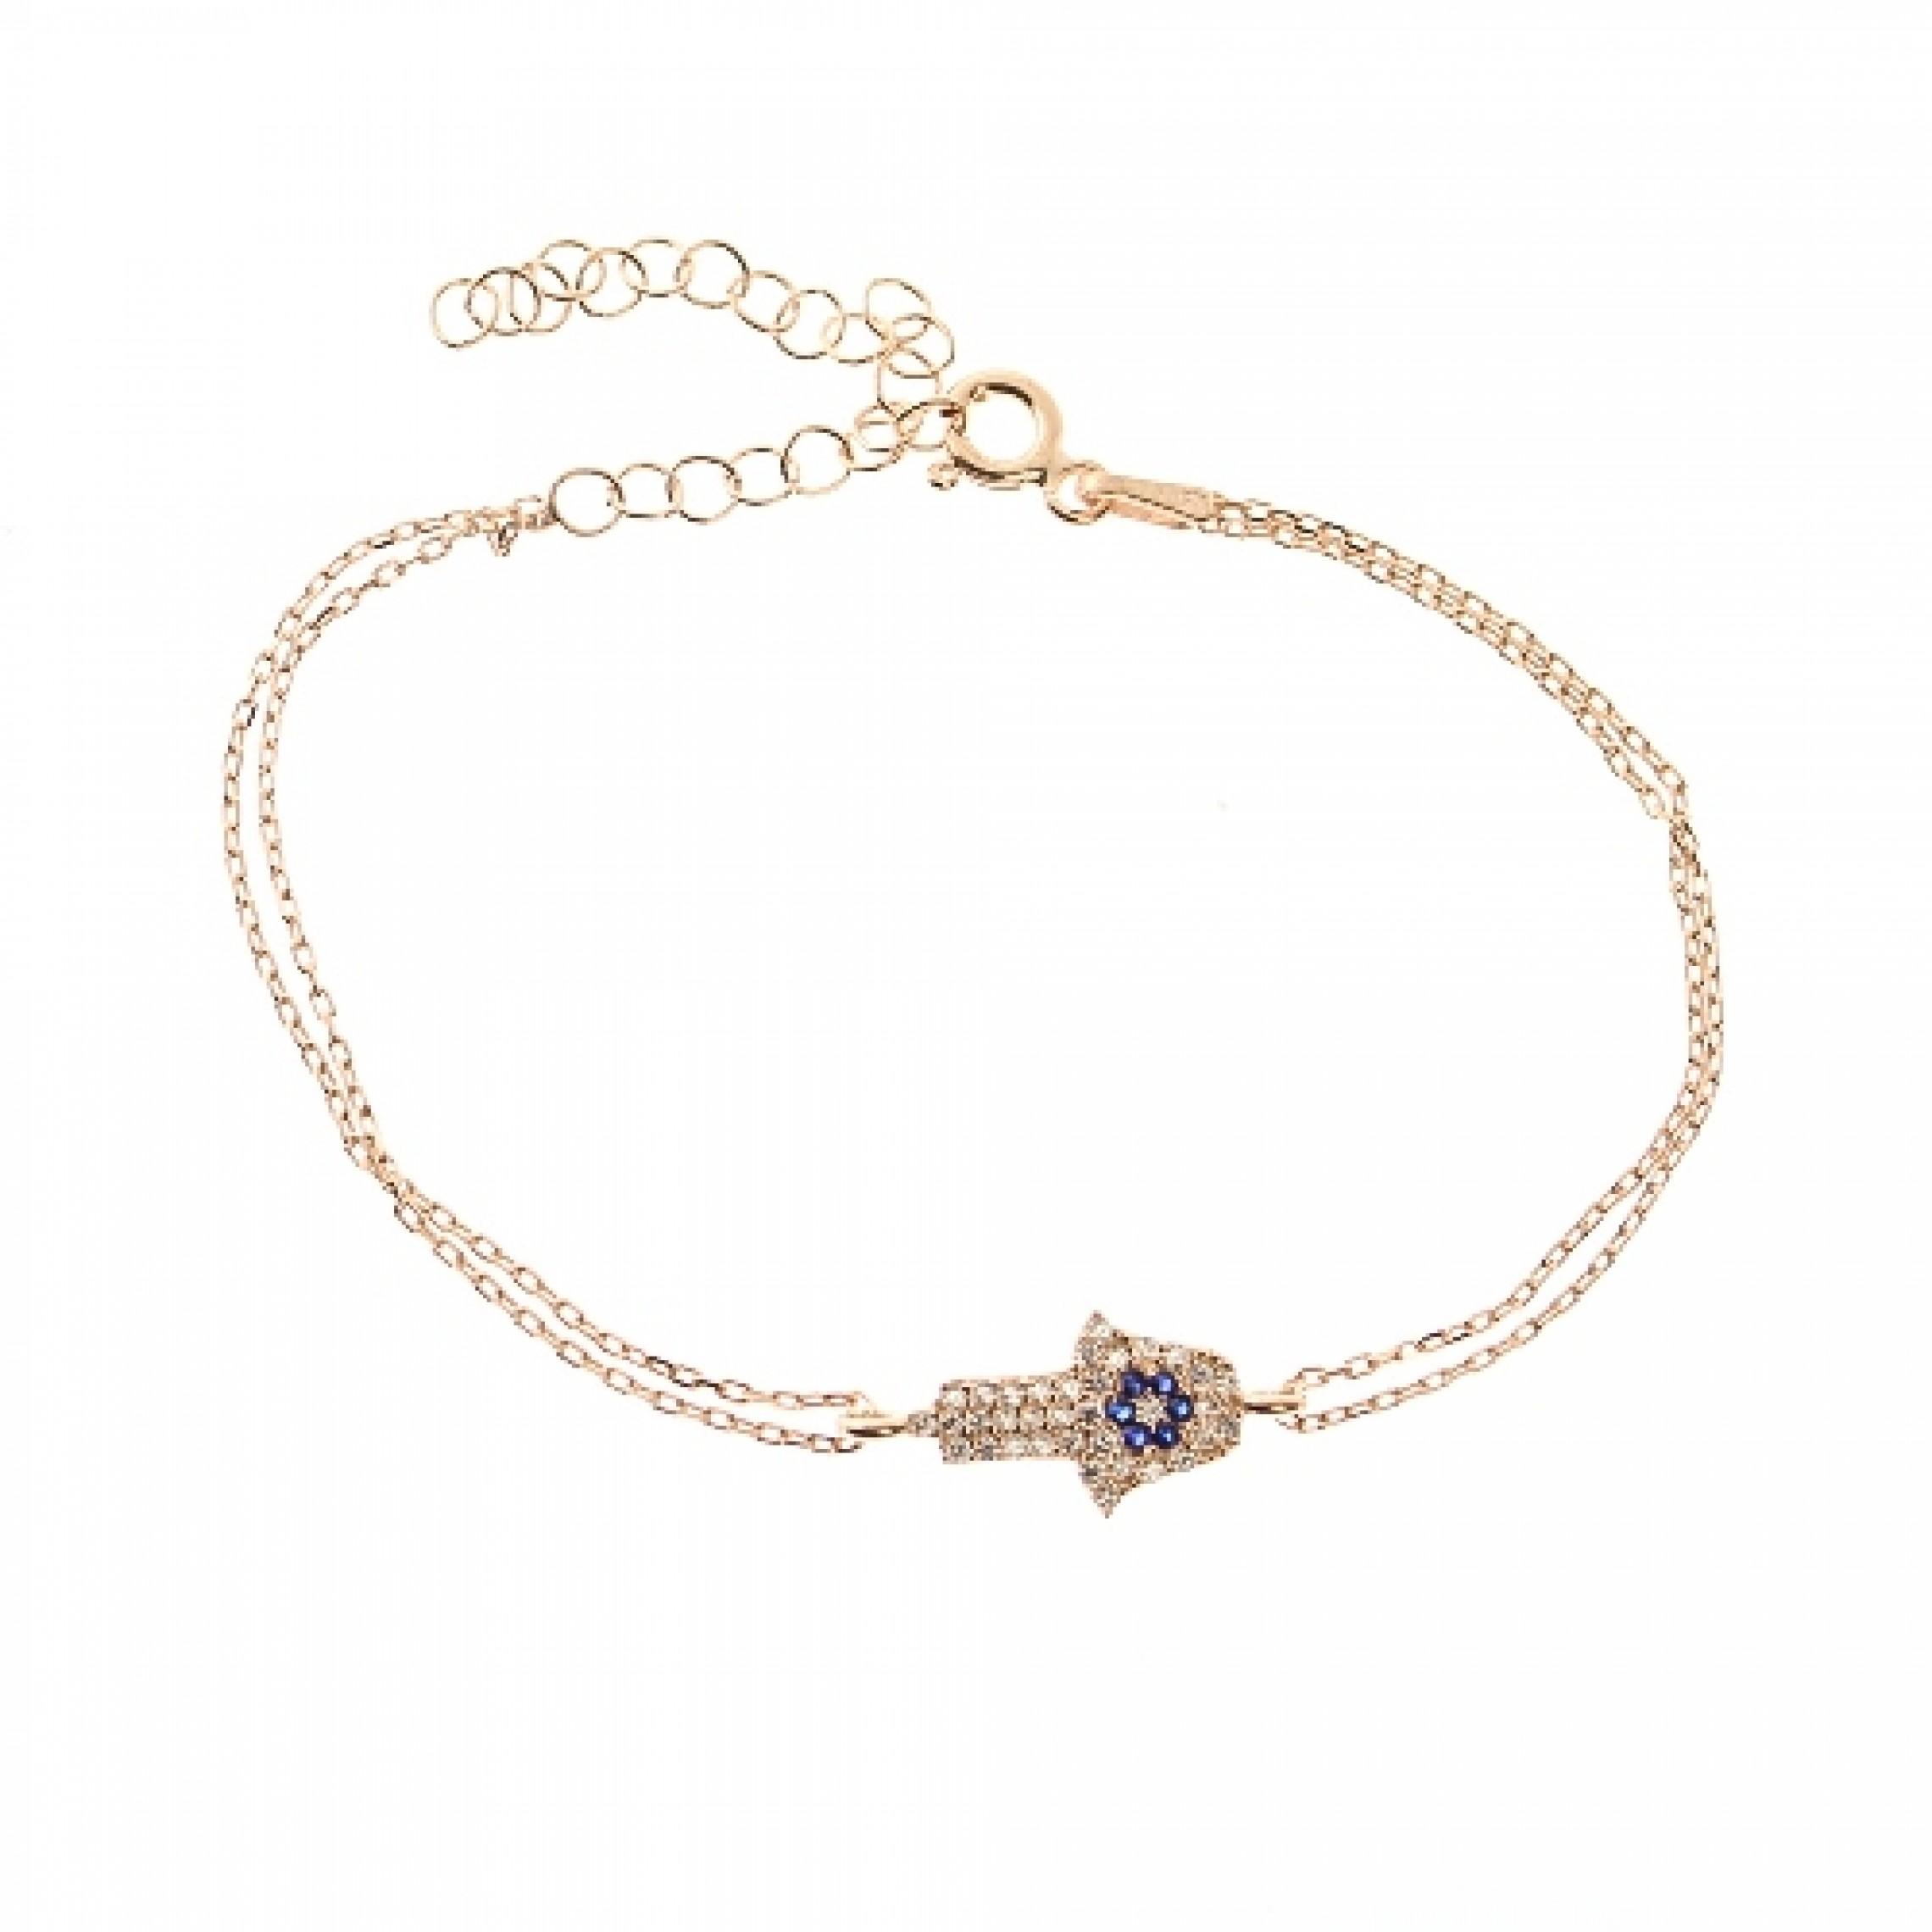 JB-180017 Evil Eye 925 Sterling Silver CZ Bracelet Hamsa